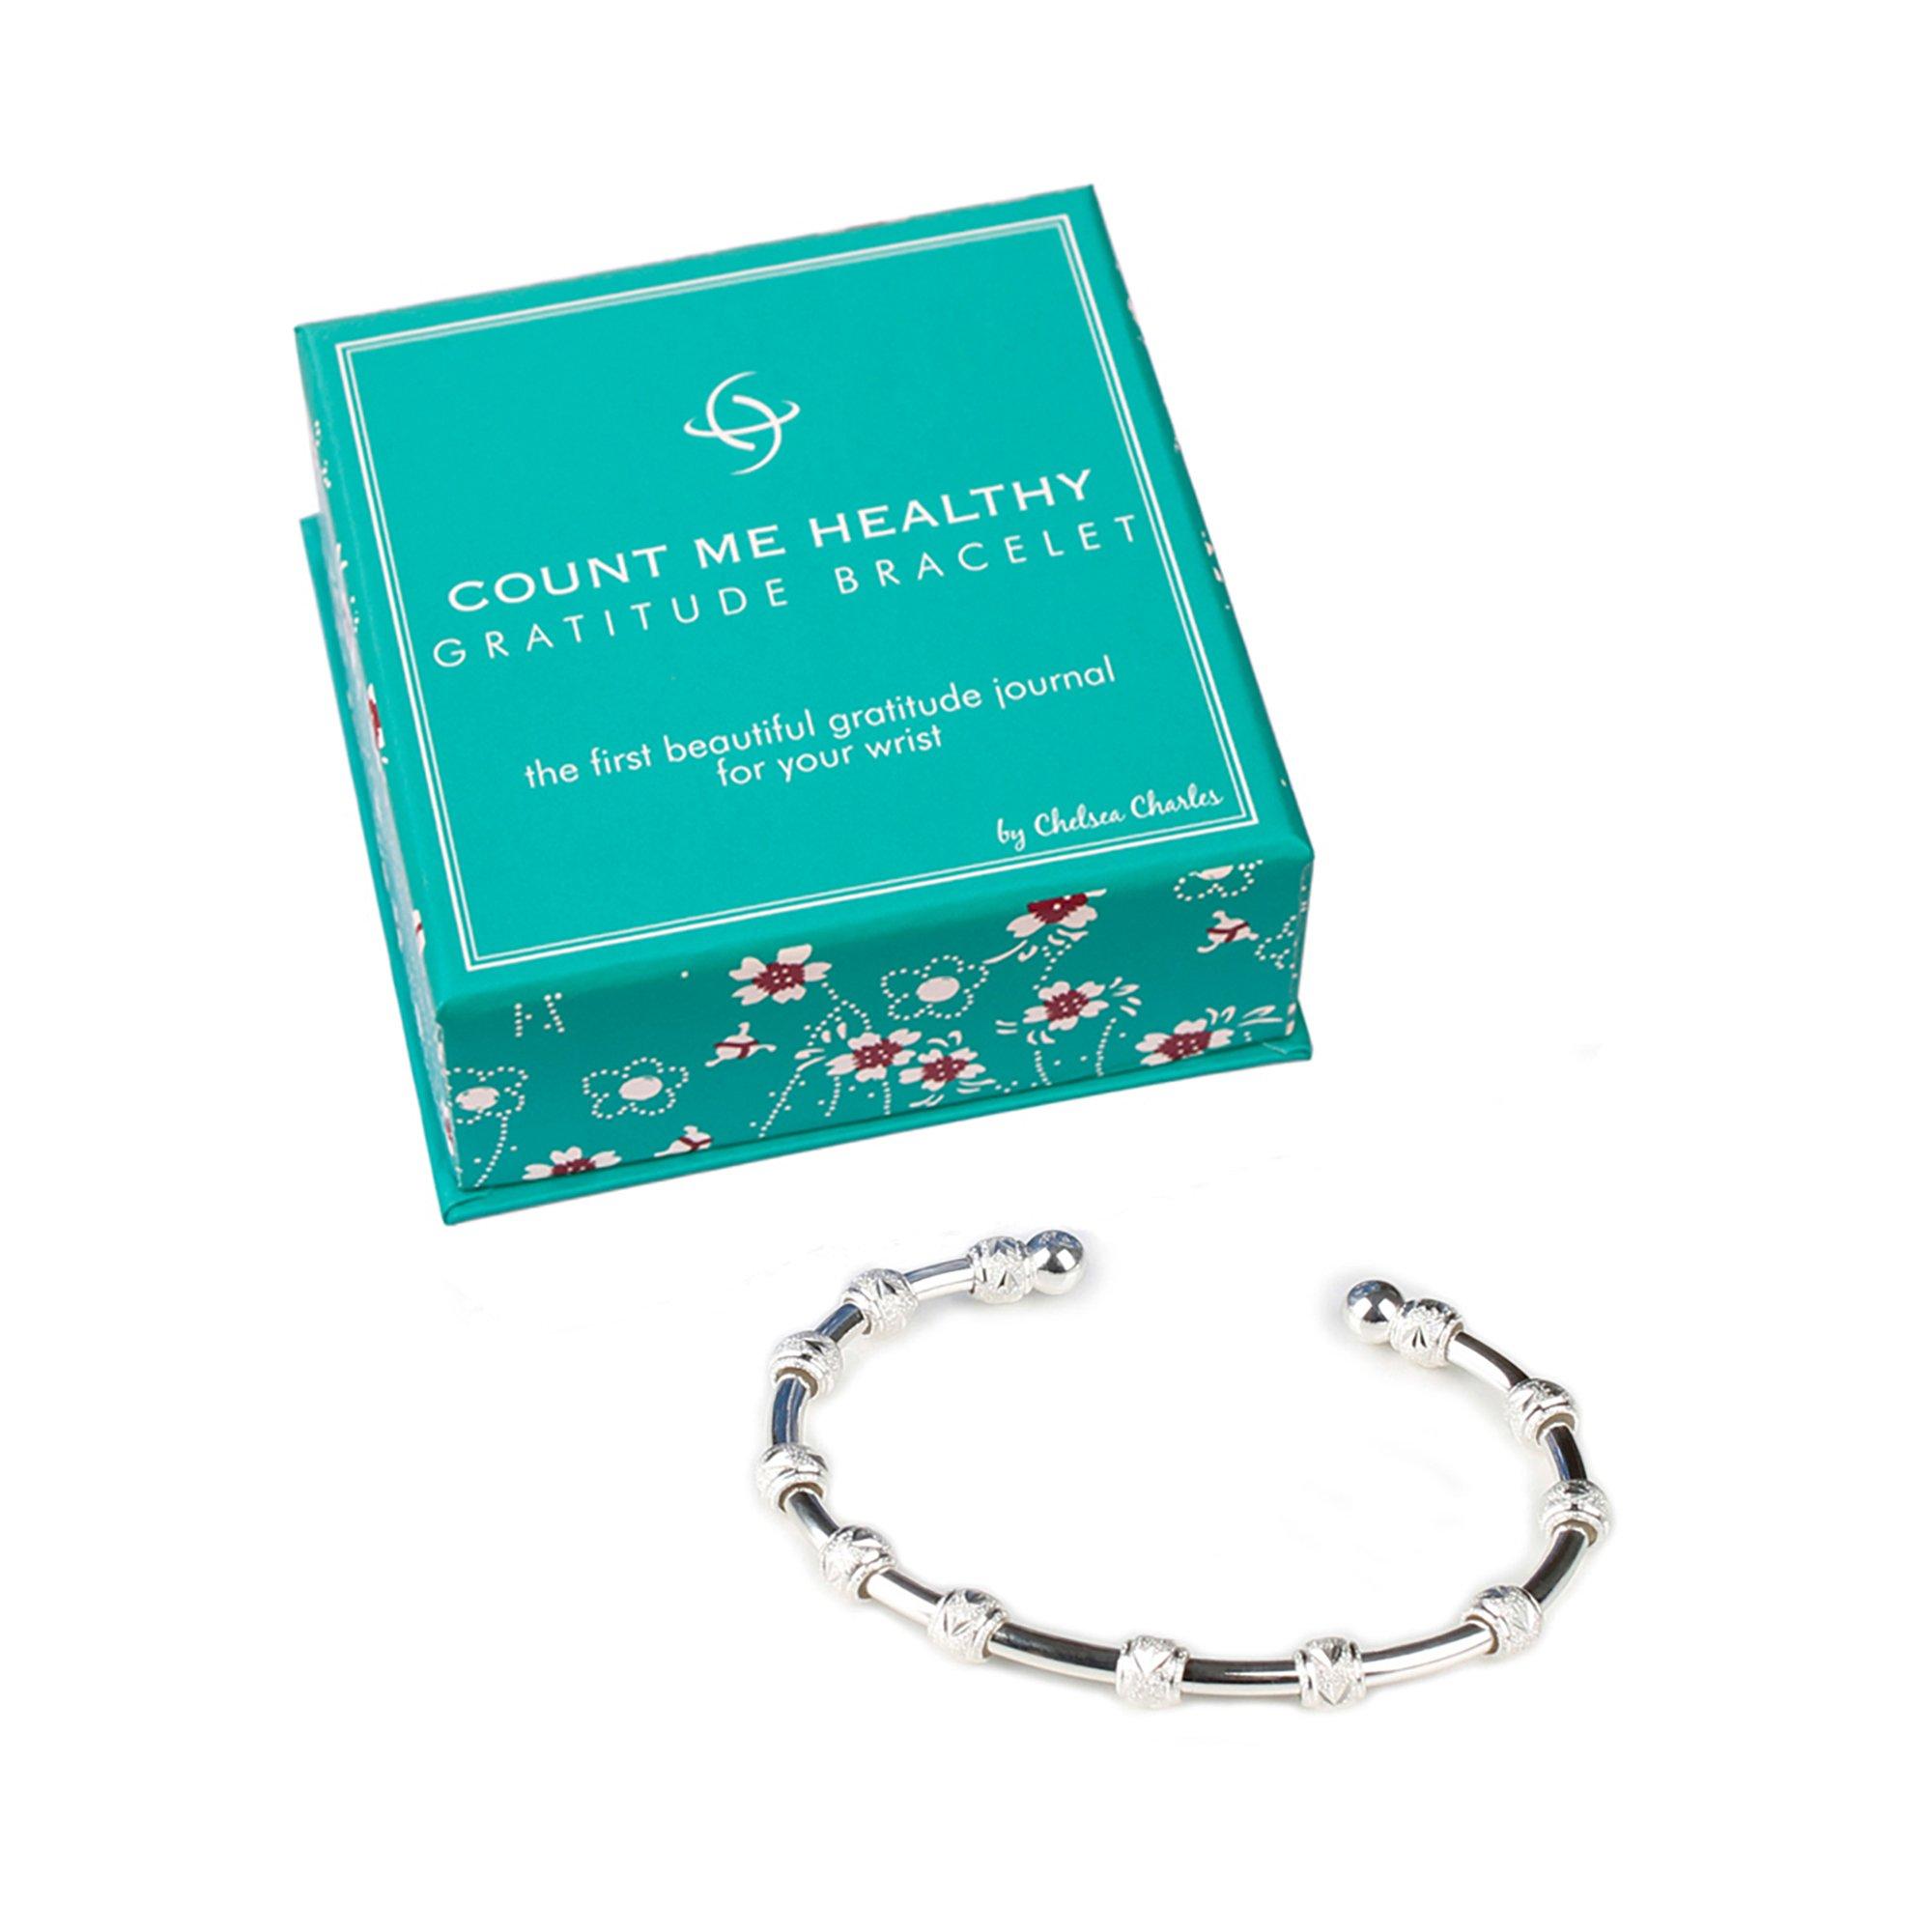 Count Me Healthy Gratitude Journal Bracelet by Chelsea ...